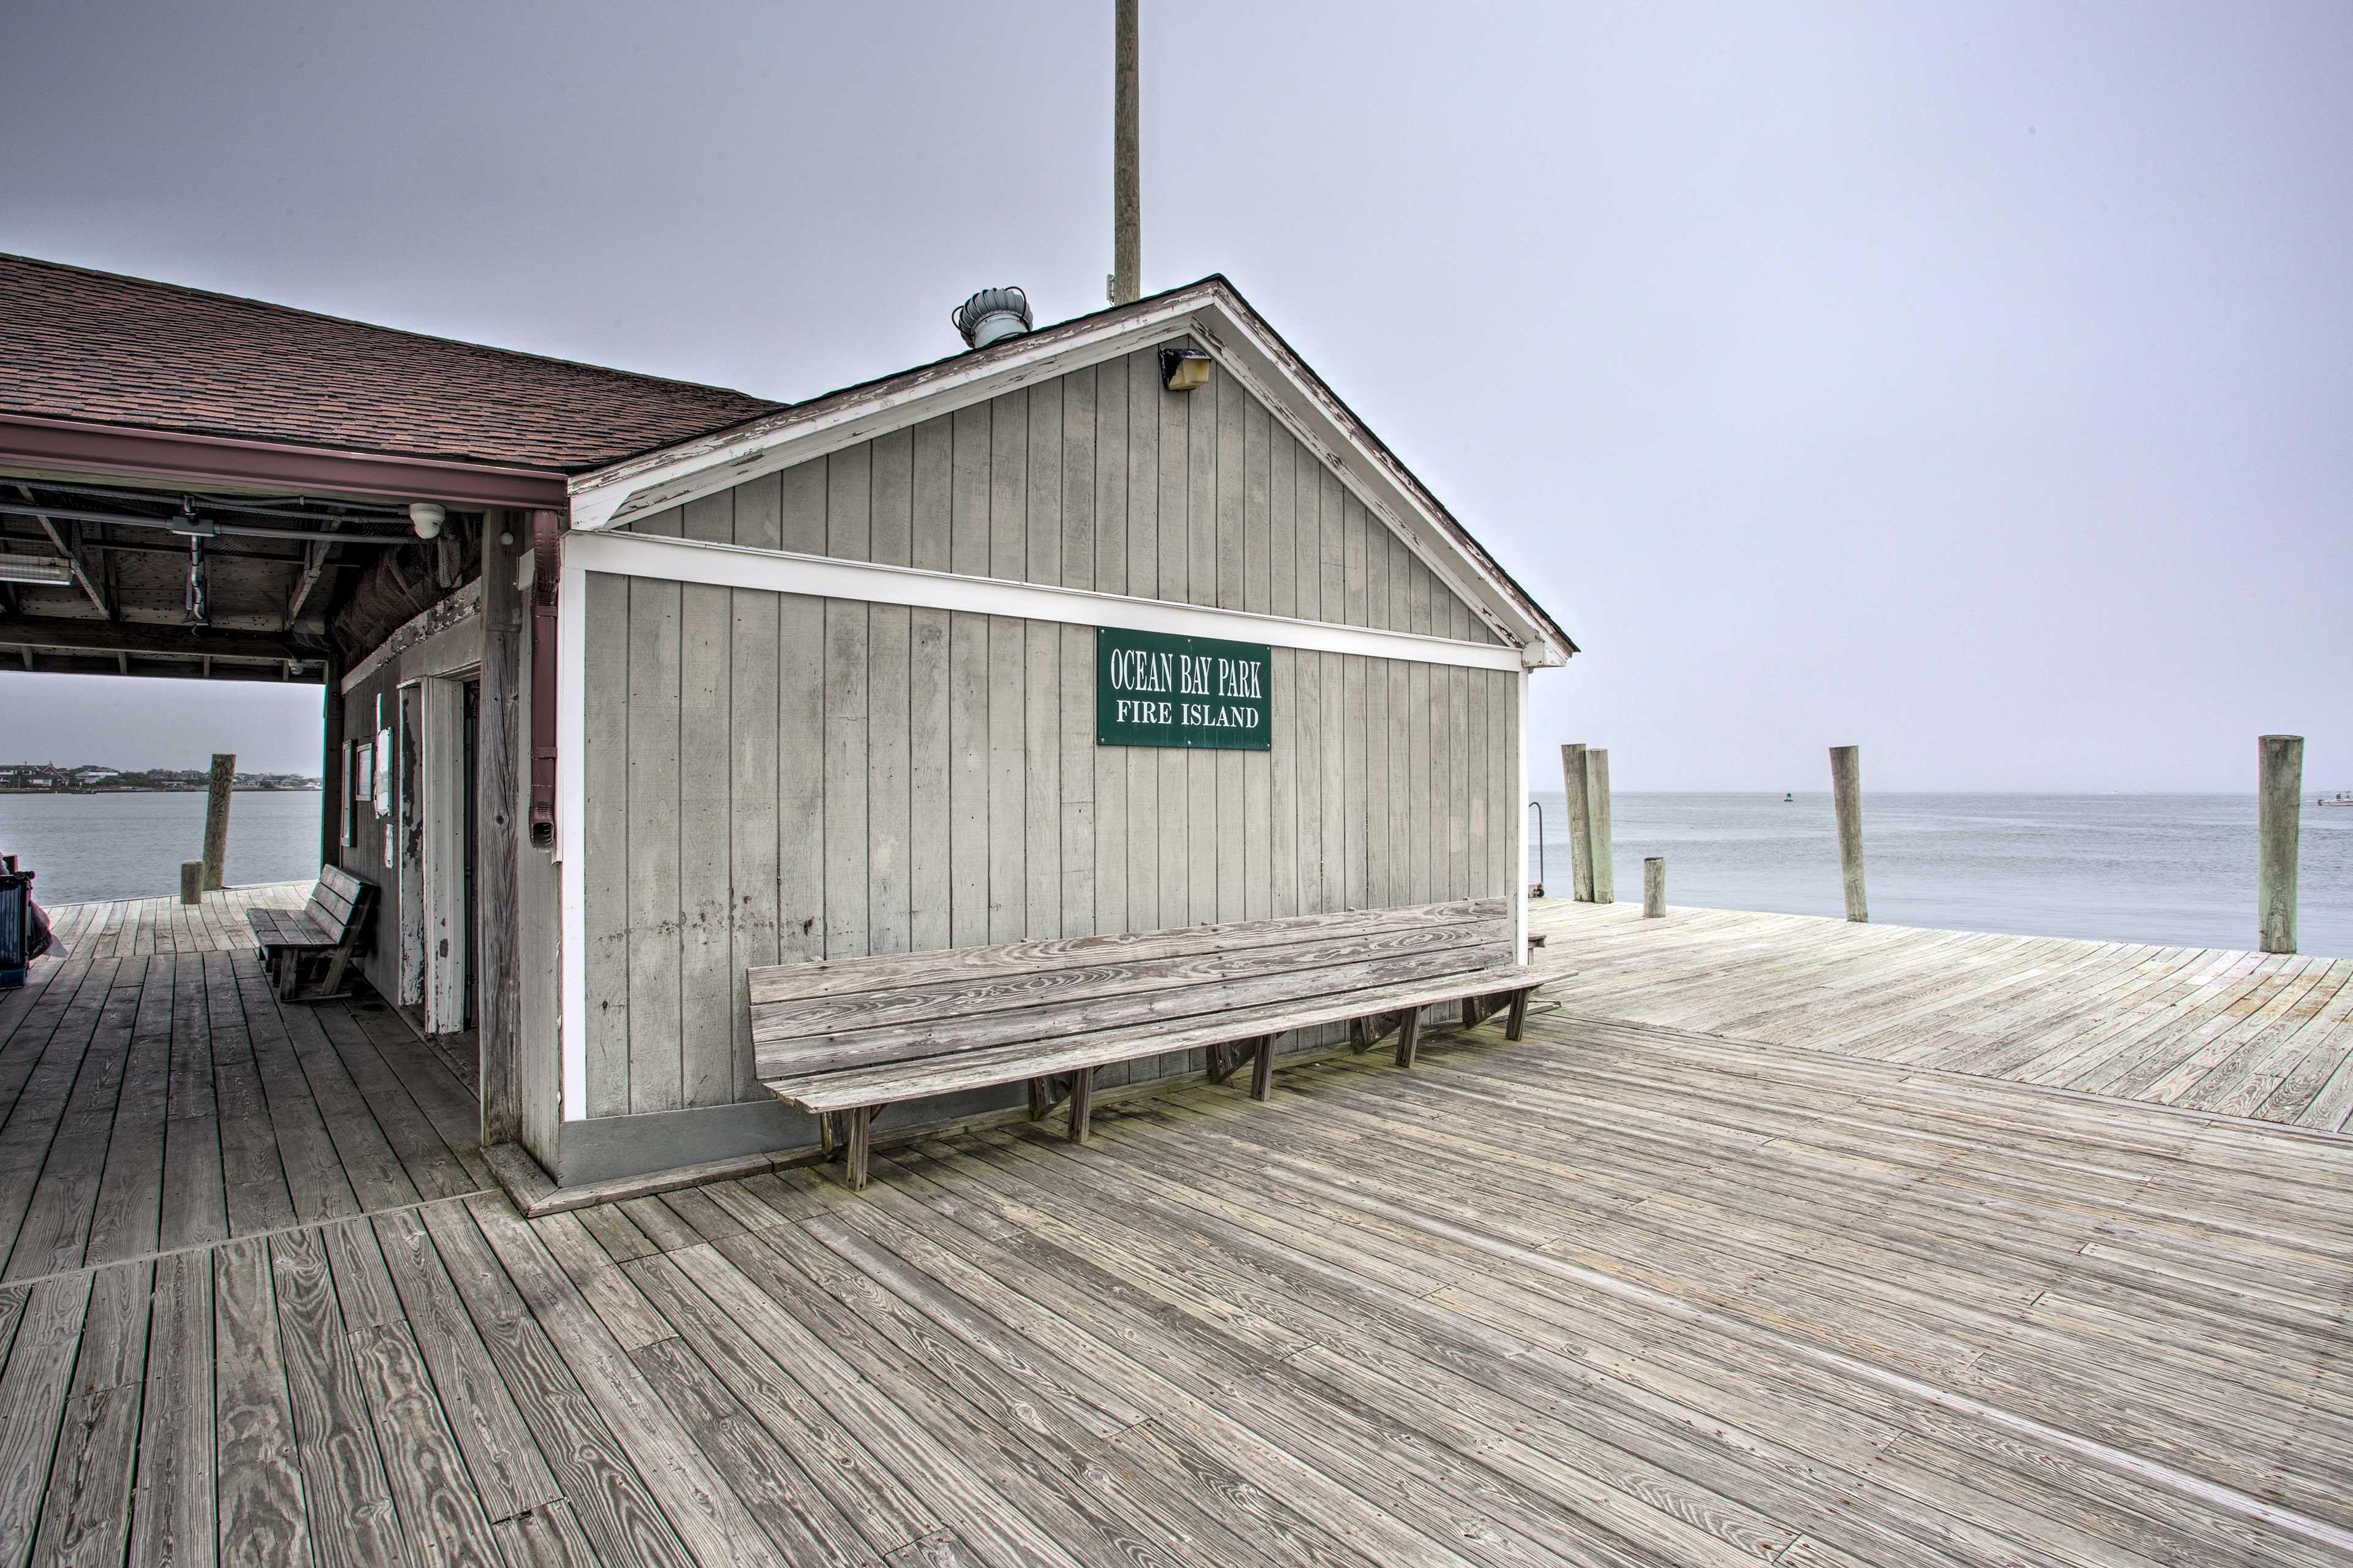 Ocean Bay Park is not far away!